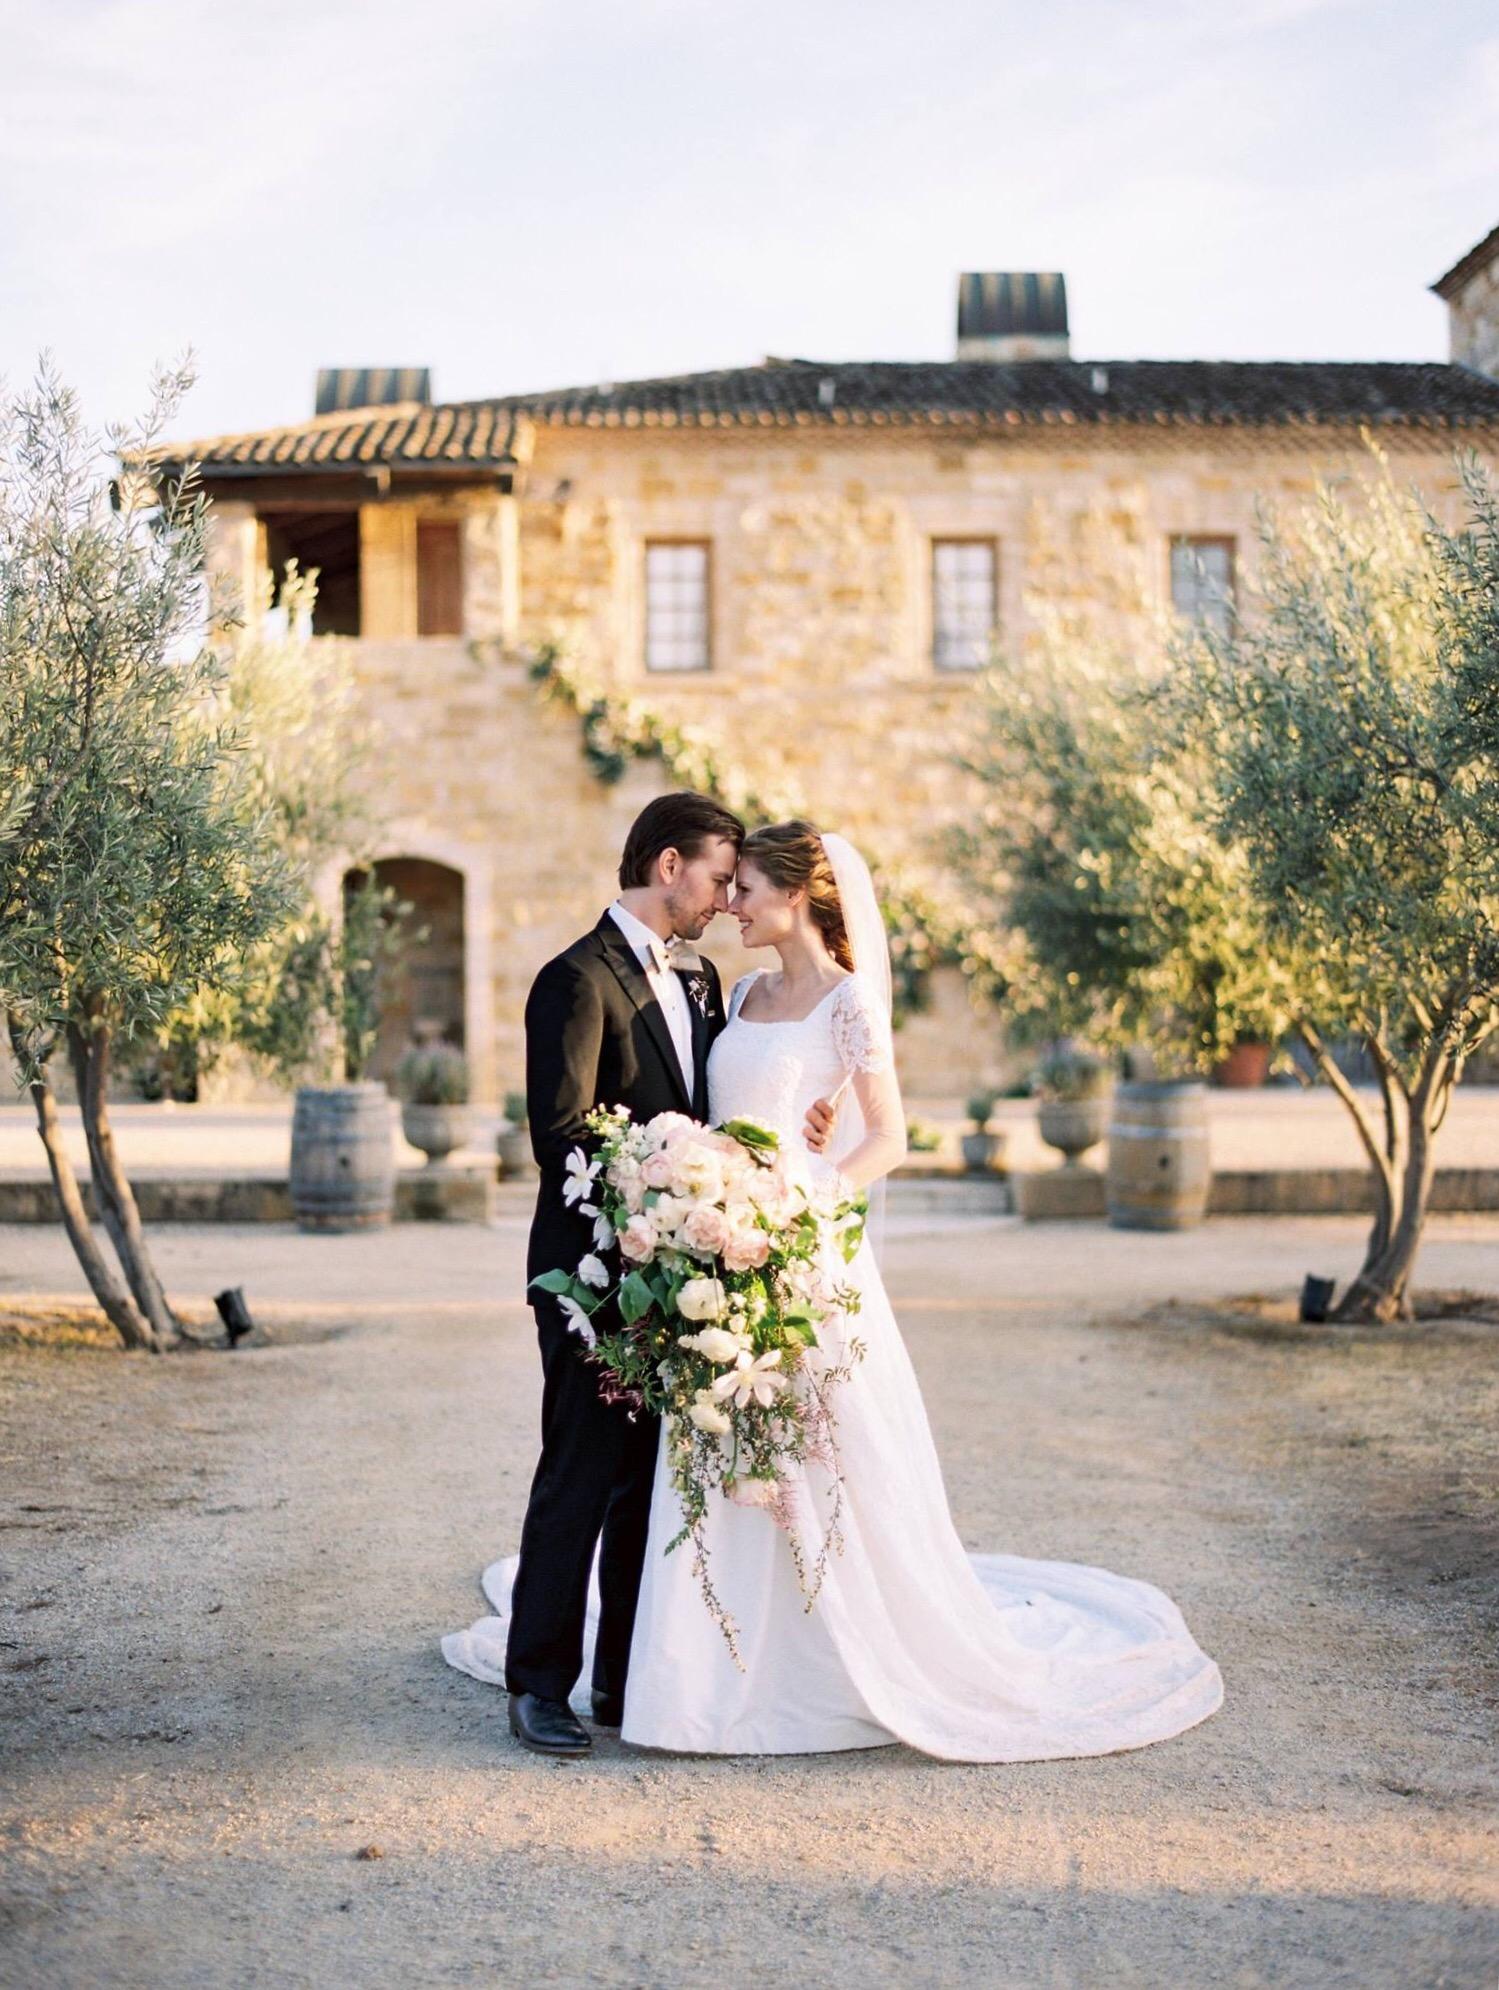 Wedding Gown Designed By Lauren Elaine Alyssa Campanella Weds Torrance Coombs At Sunstone Villa In Bridal